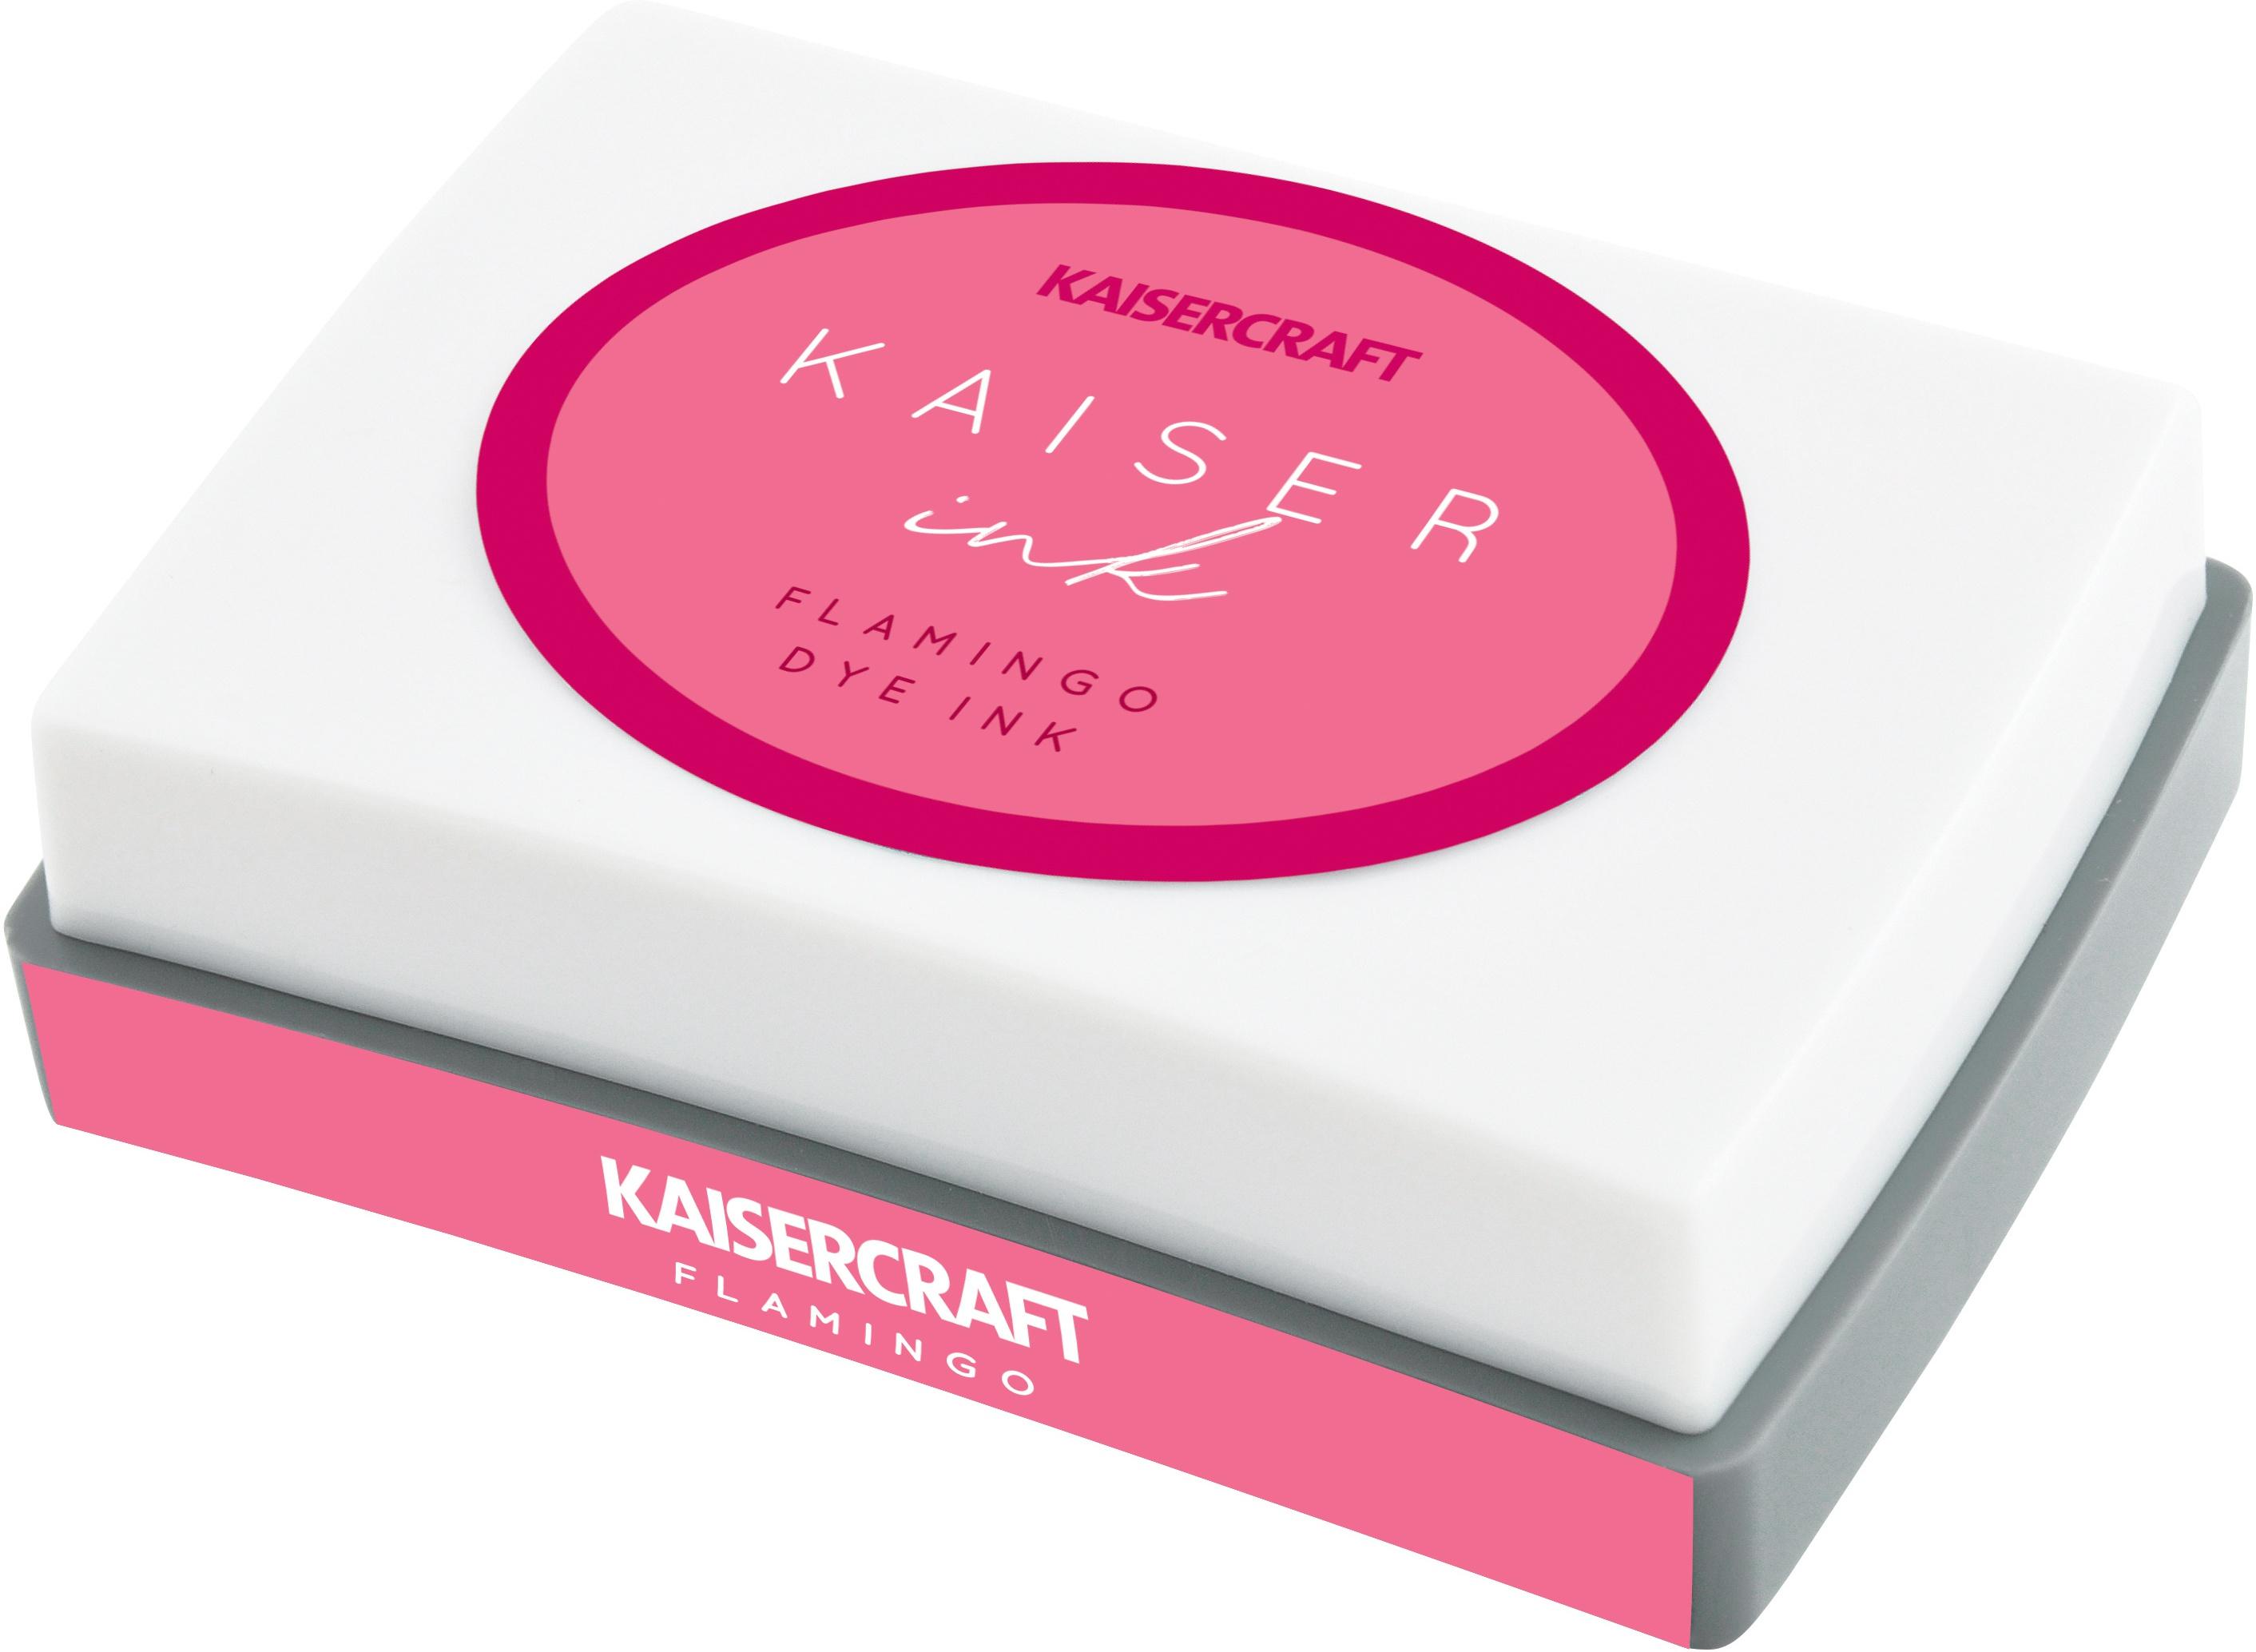 KaiserInk Ink Pad-Flamingo